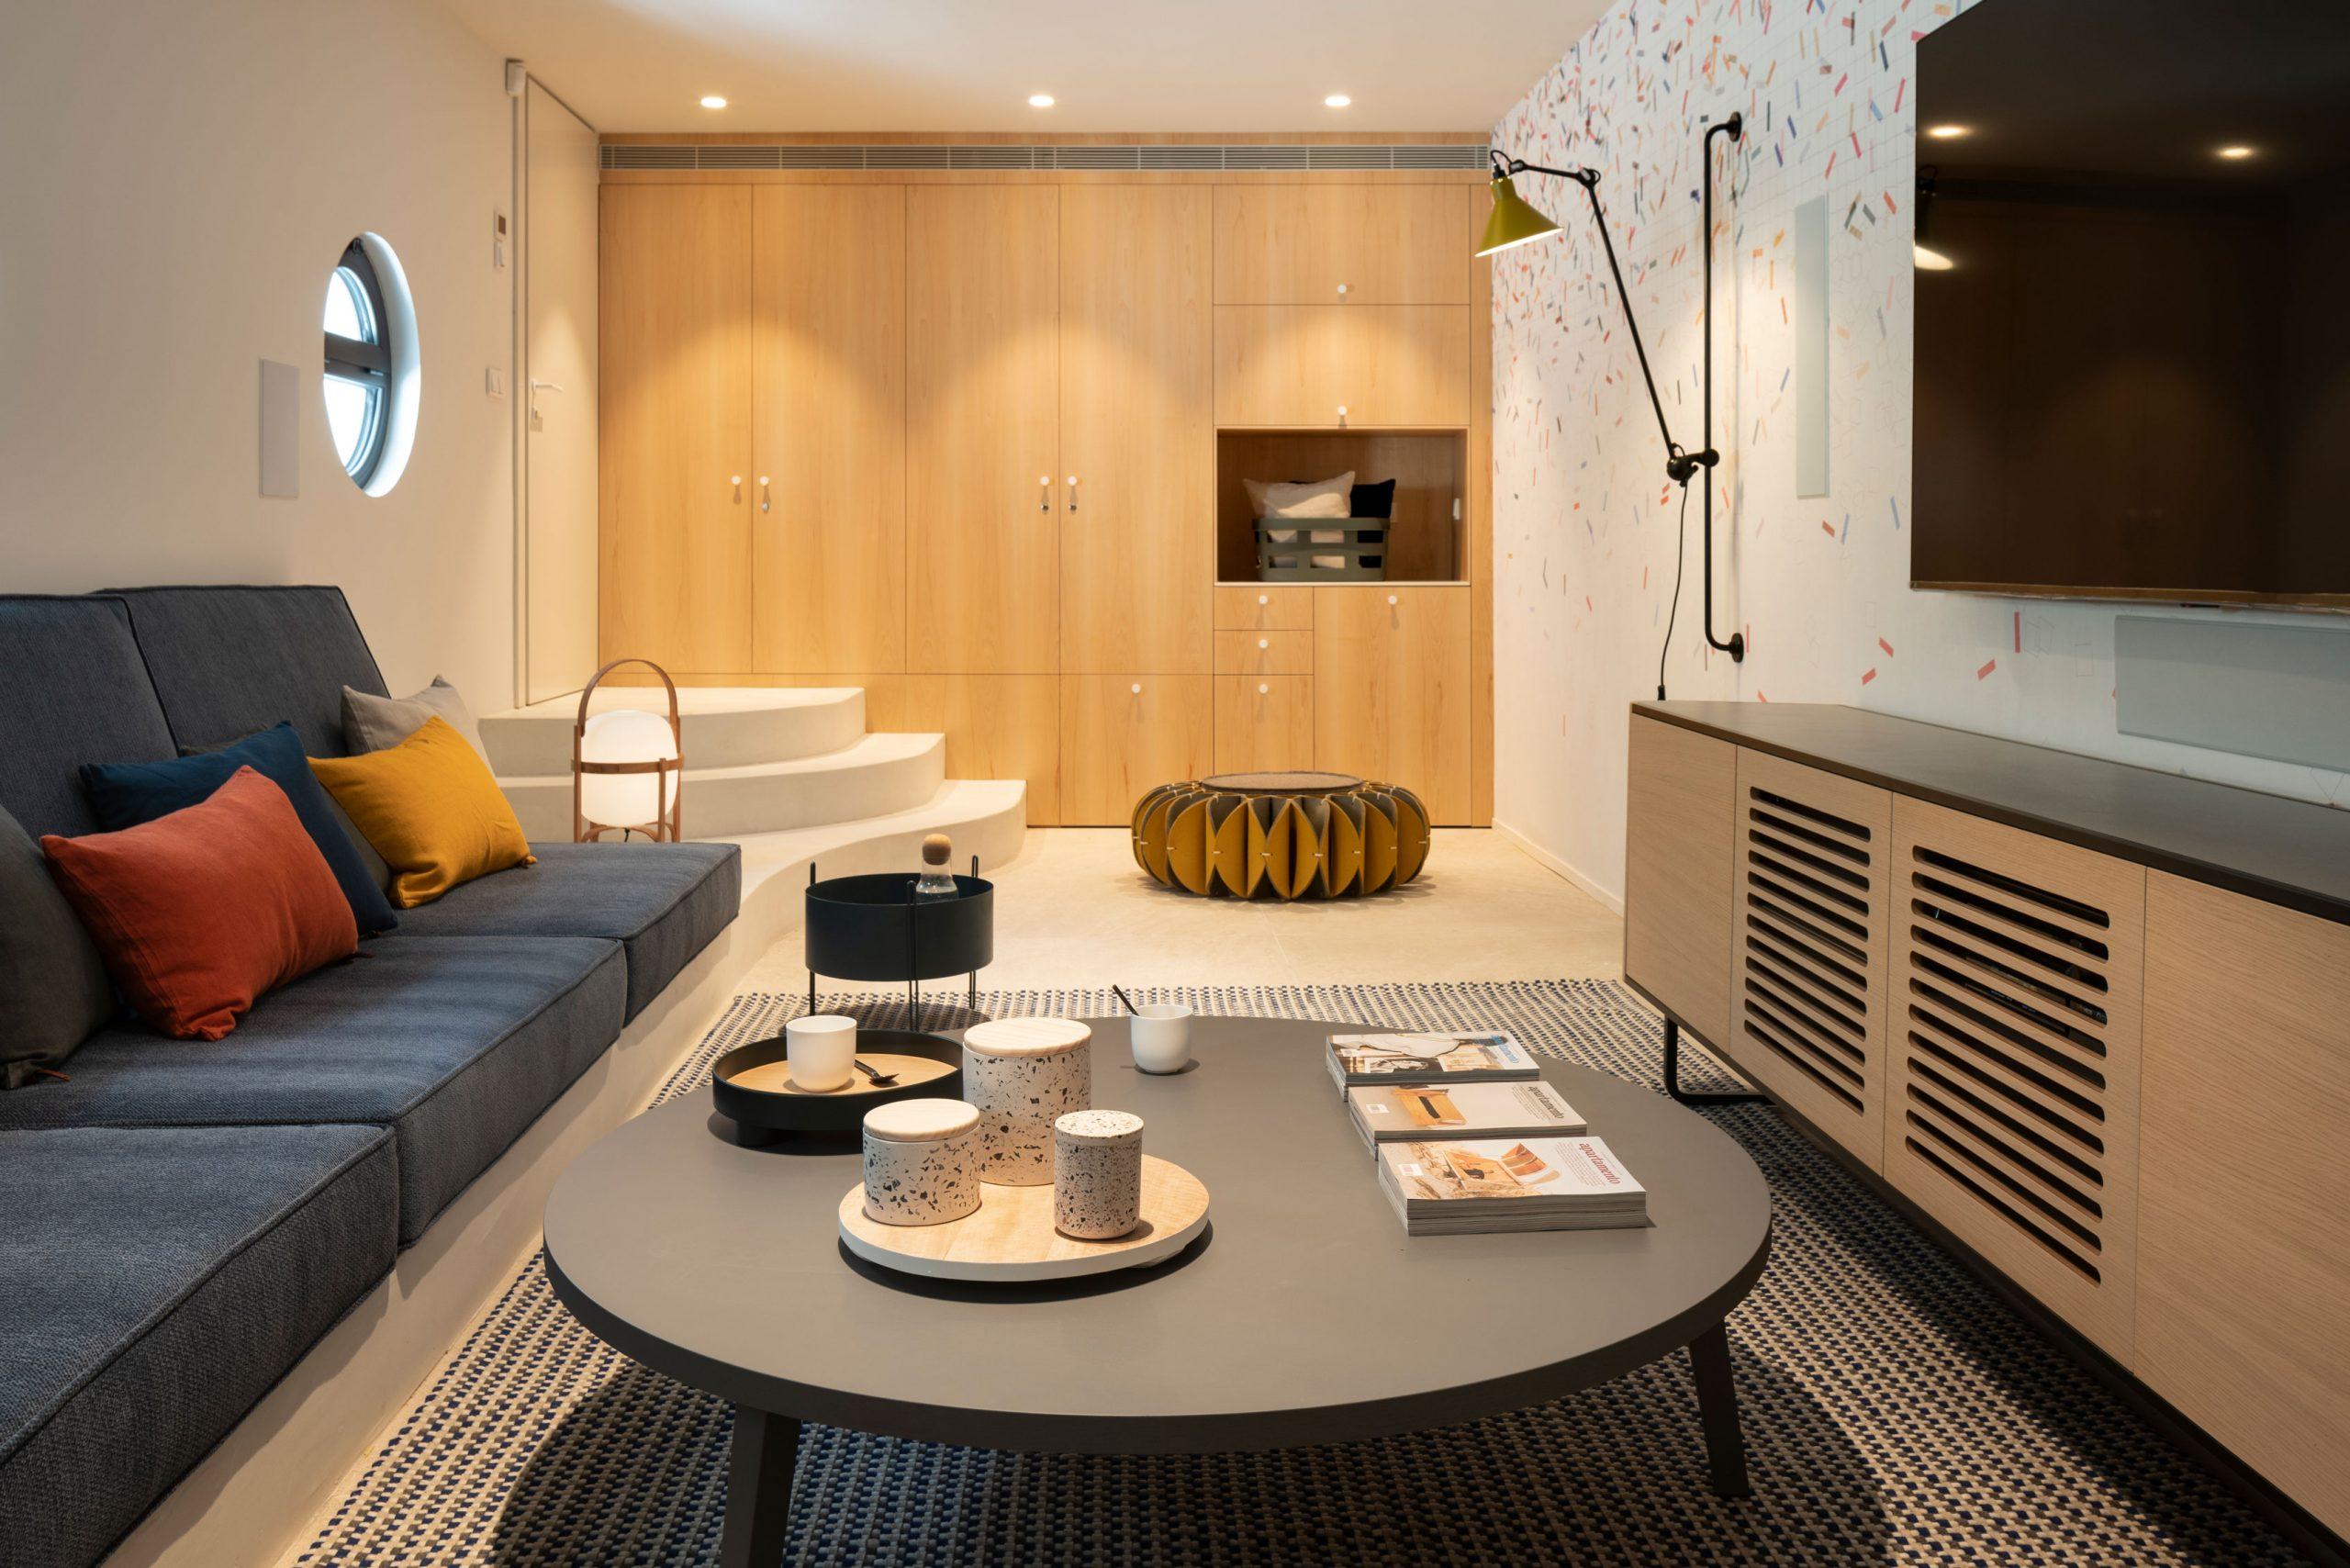 Proyecto interiorismo The Room Studio + Momocca